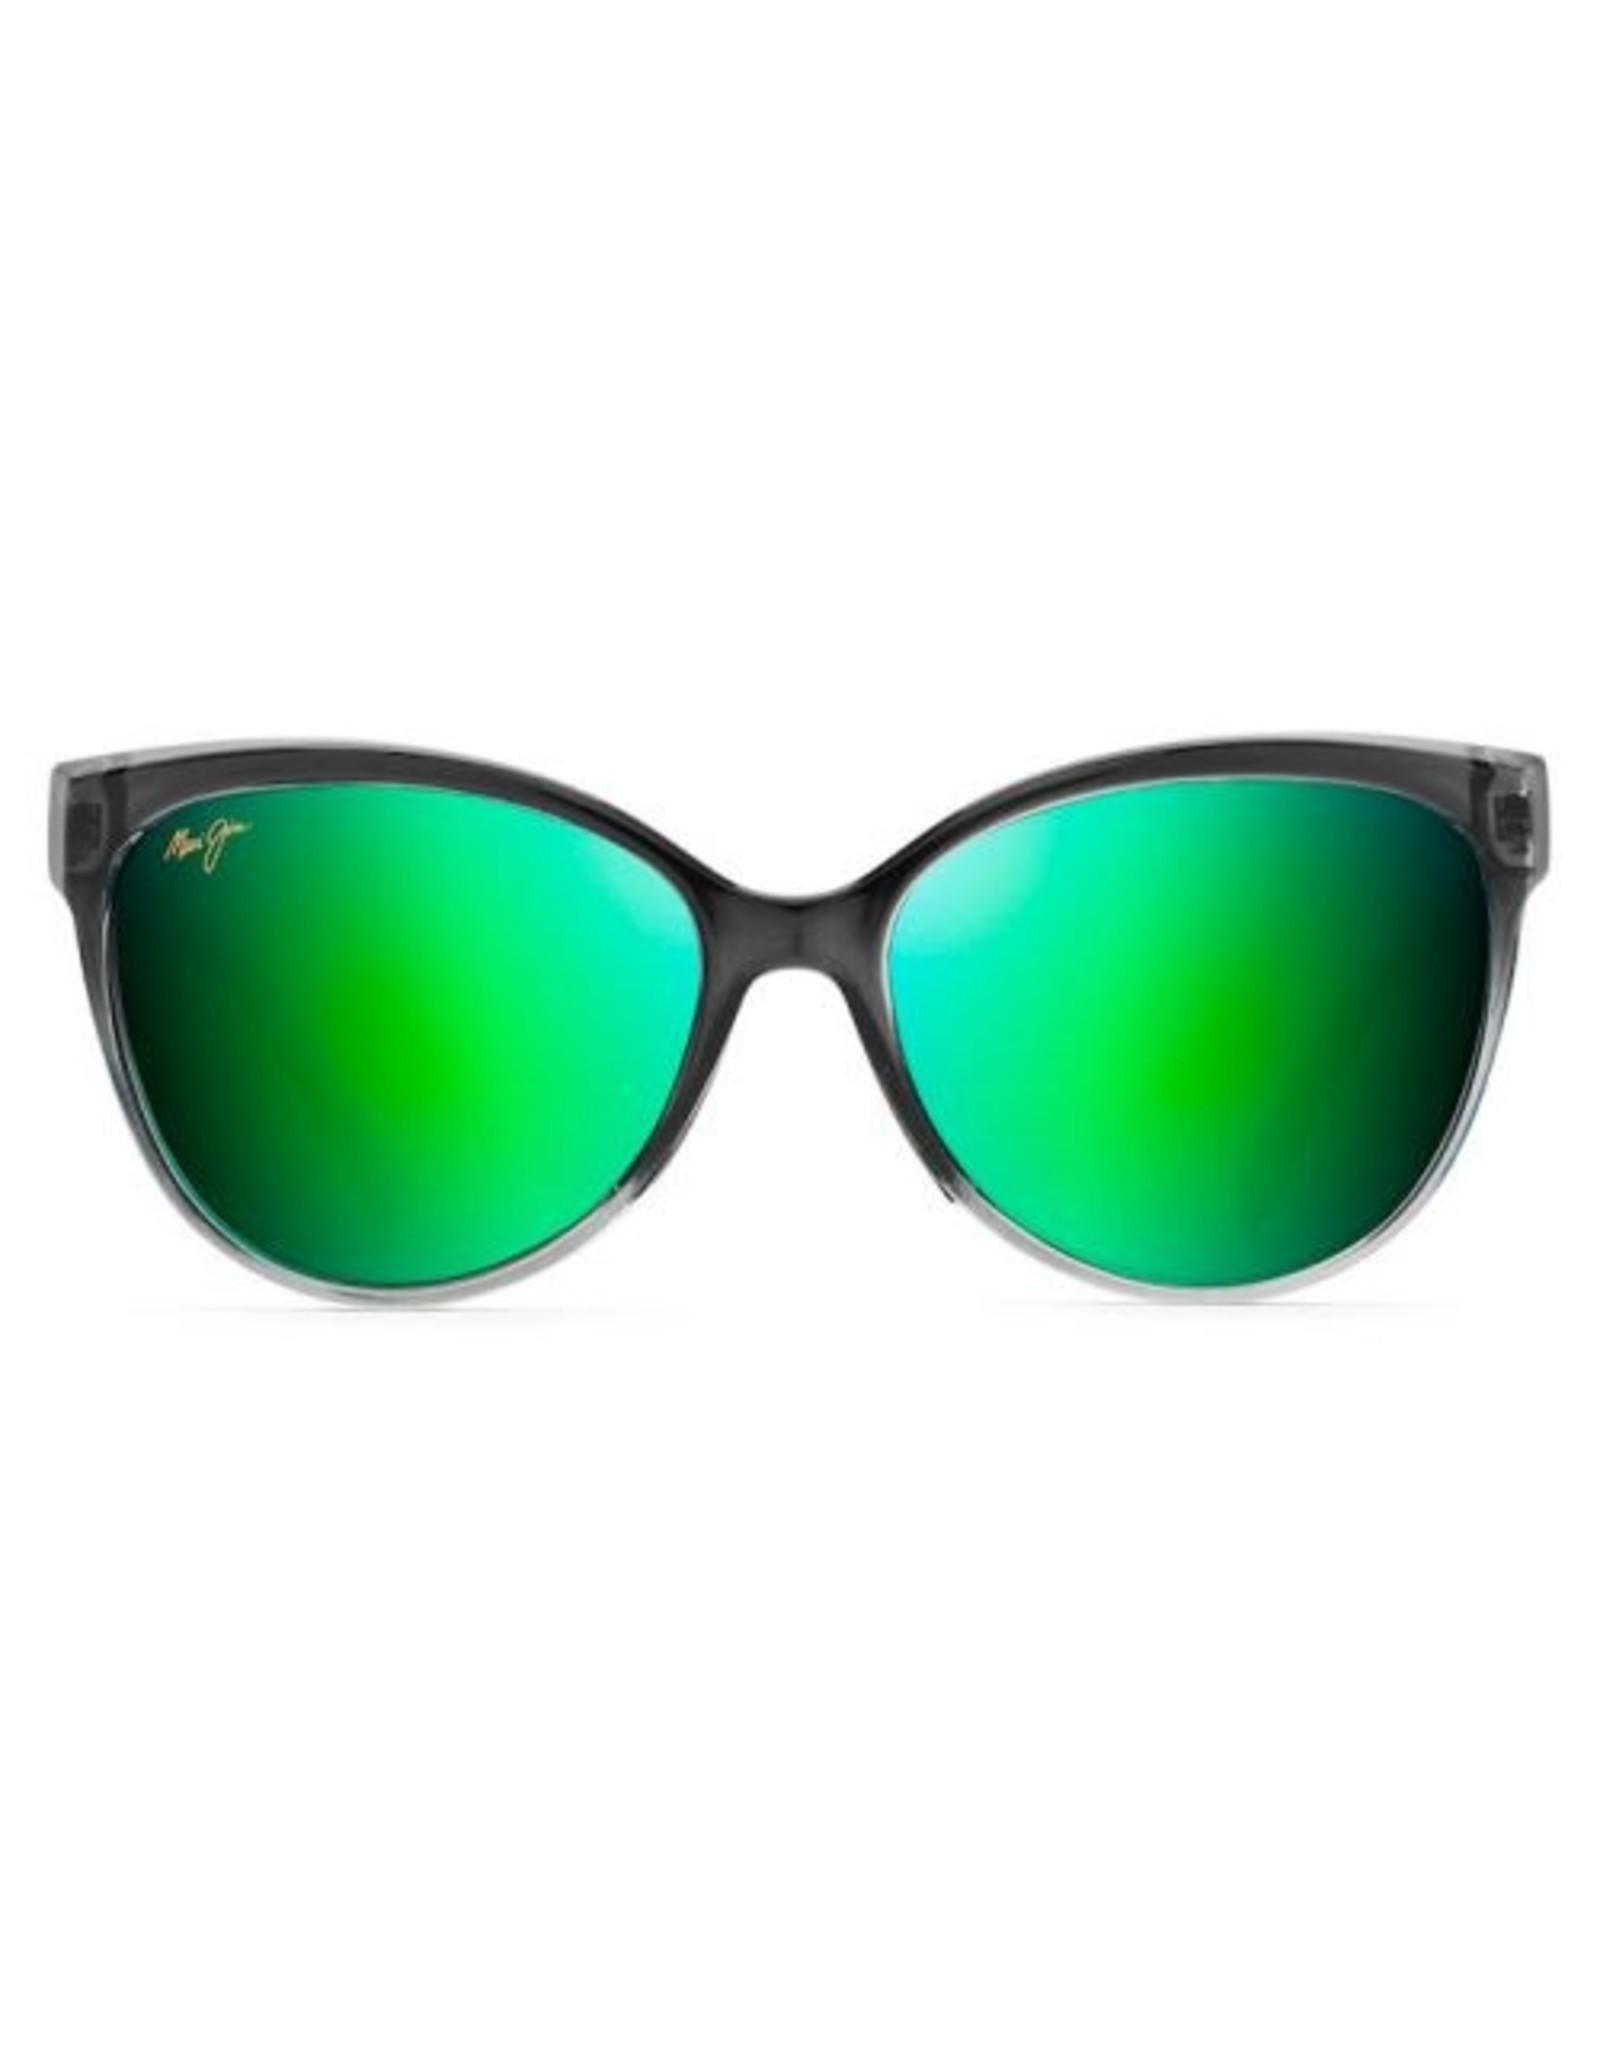 Maui Jim Maui Jim 'OLU OLU' Sunglasses